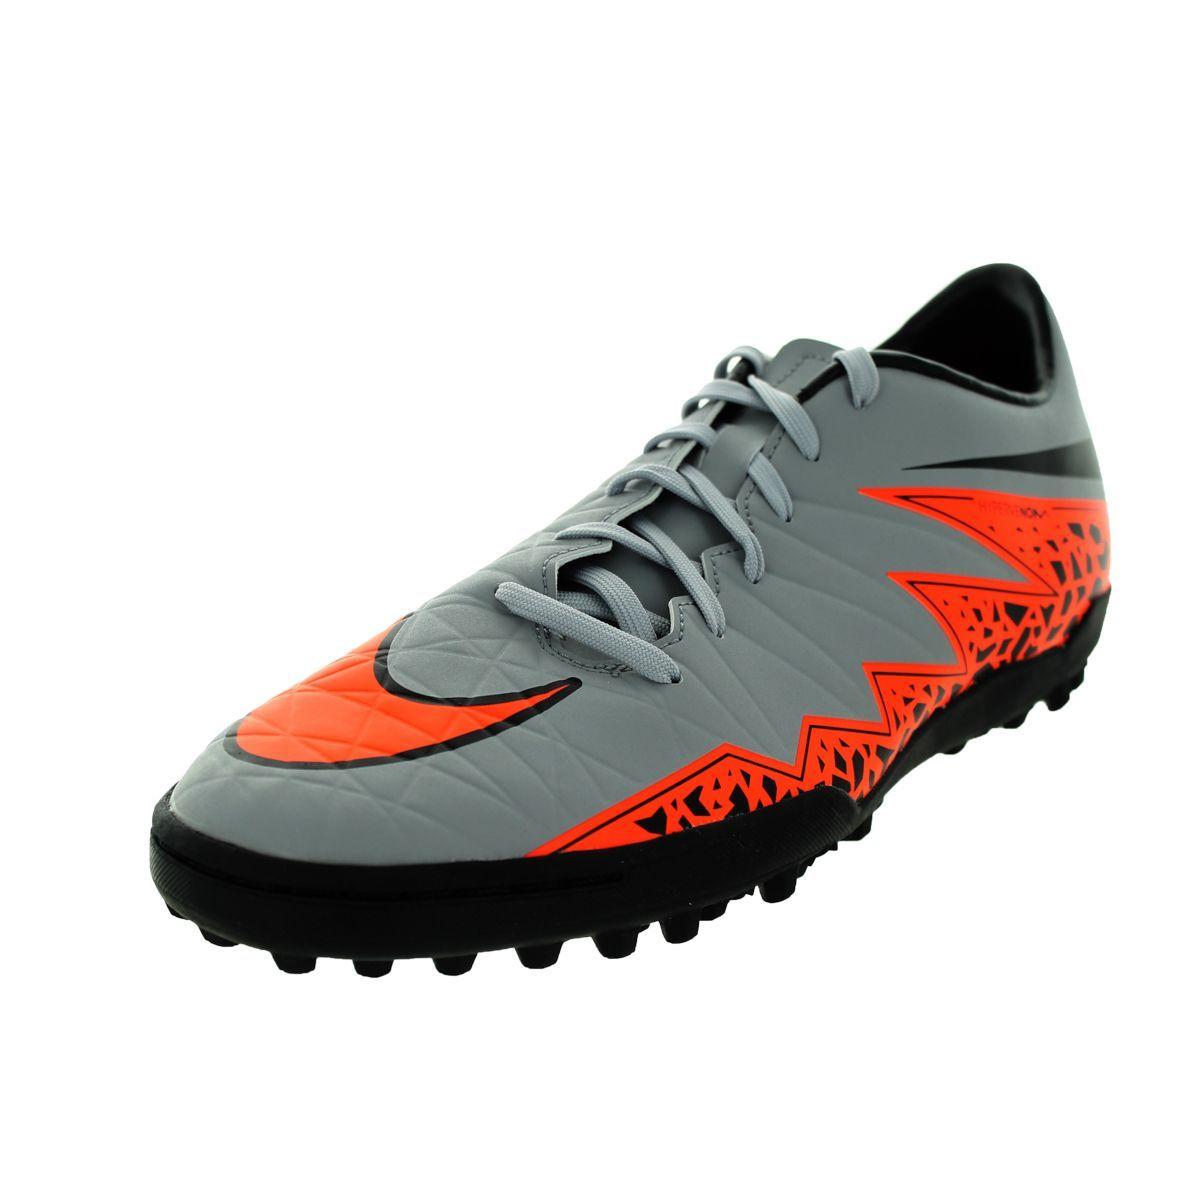 Nike Men S Hypervenom Phelon Ii Tf Wolf Grey Total Orange Black Black Turf Soccer Shoe Nike Men Soccer Shoes Wrestling Shoes